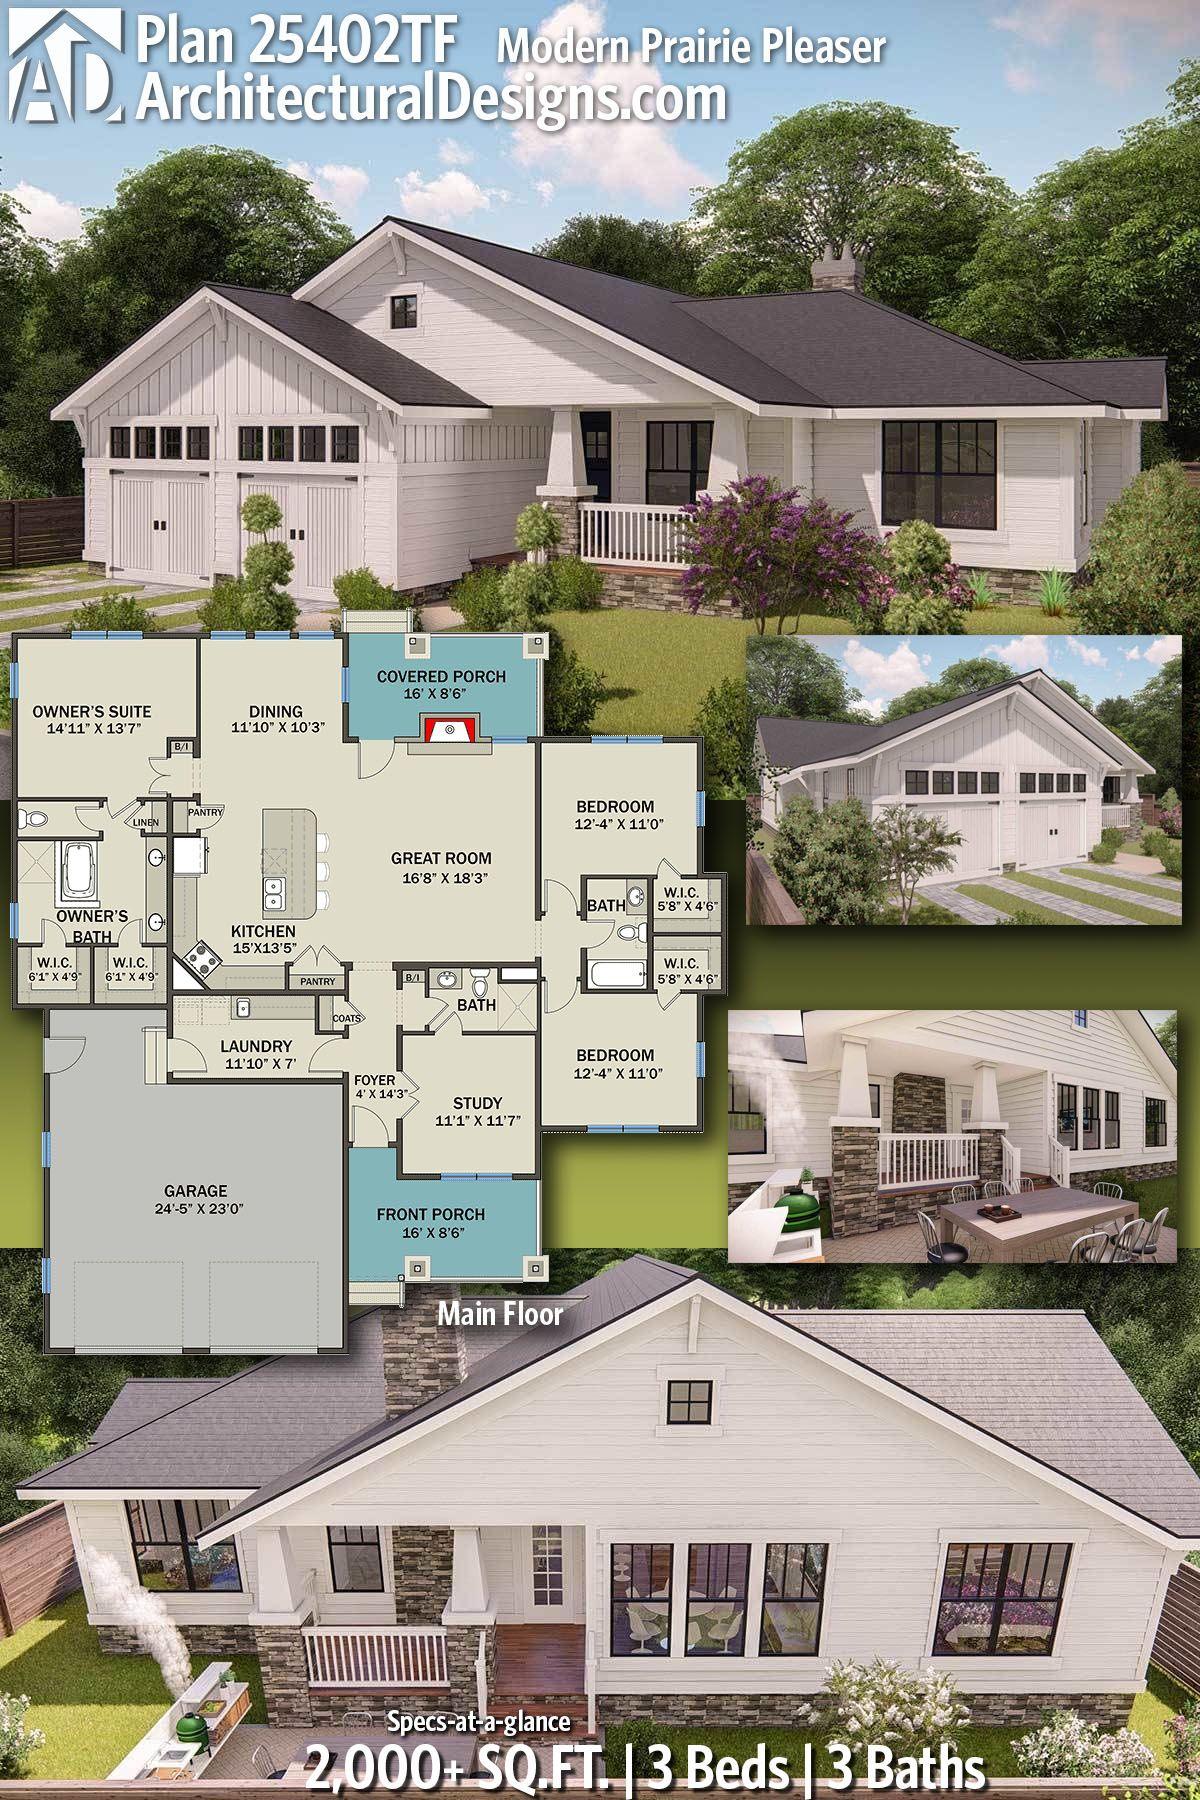 this is great architectural designs modern prairie house plan rh pinterest com